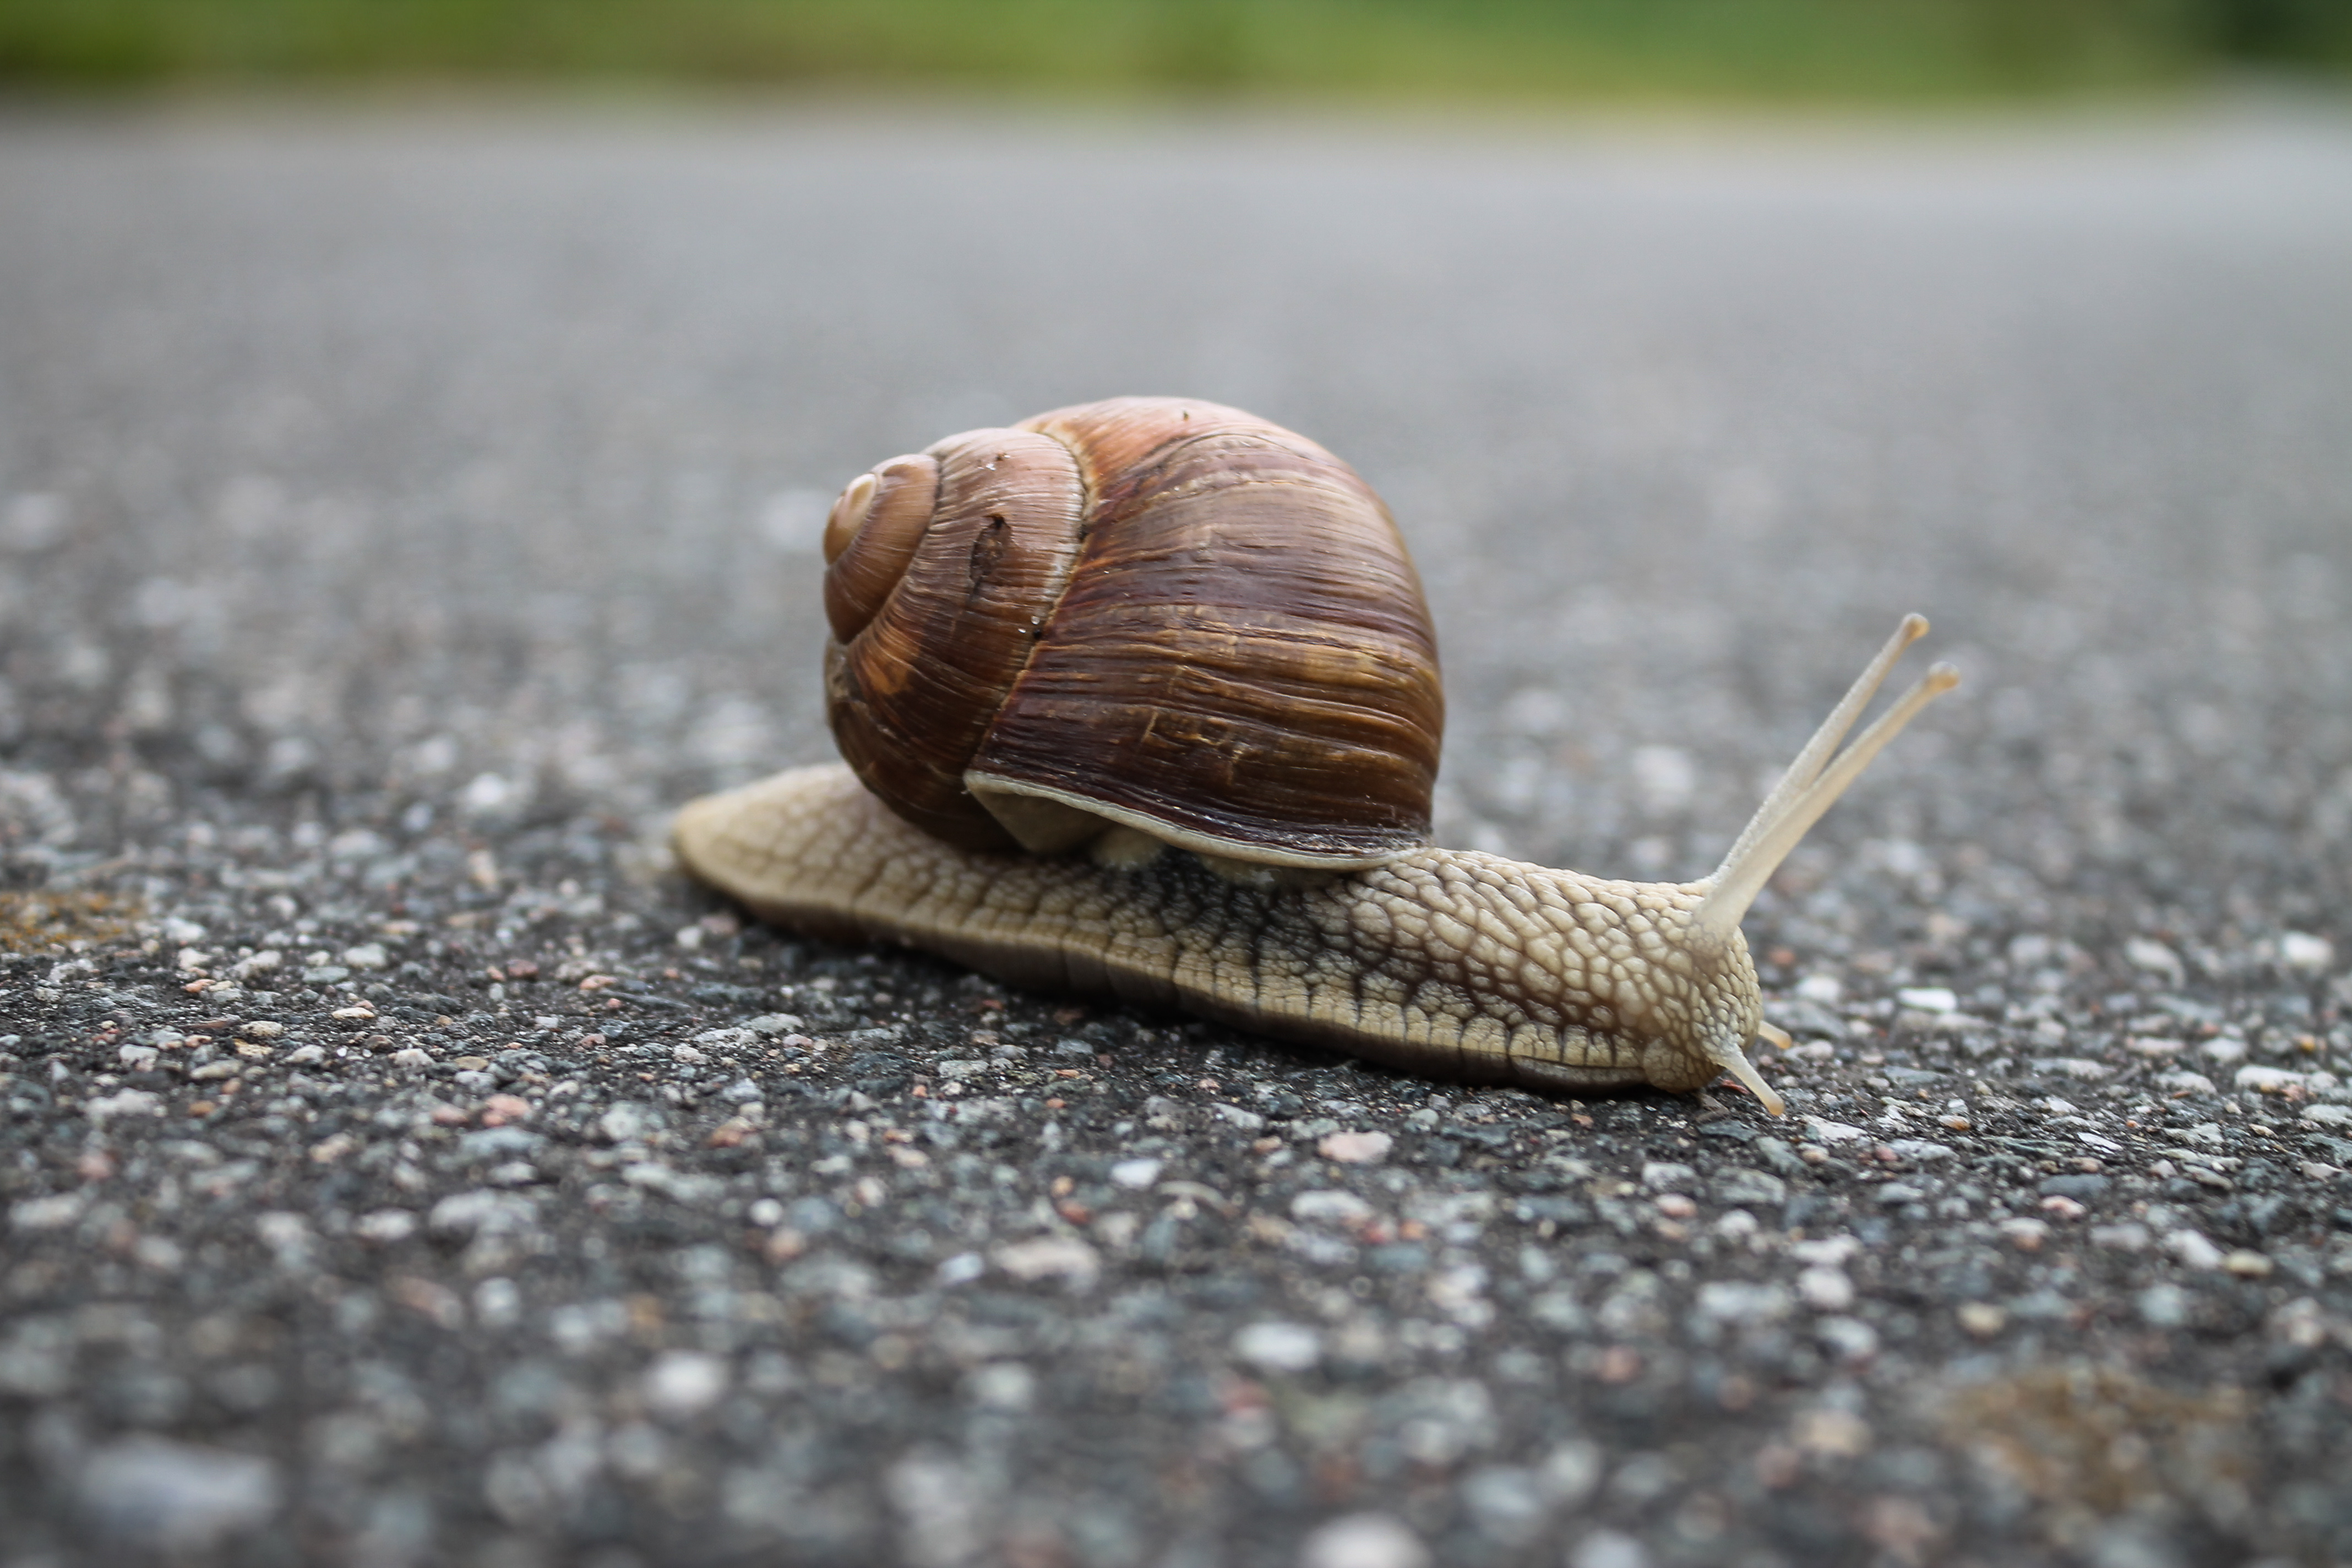 Closeup of snail on the street photo